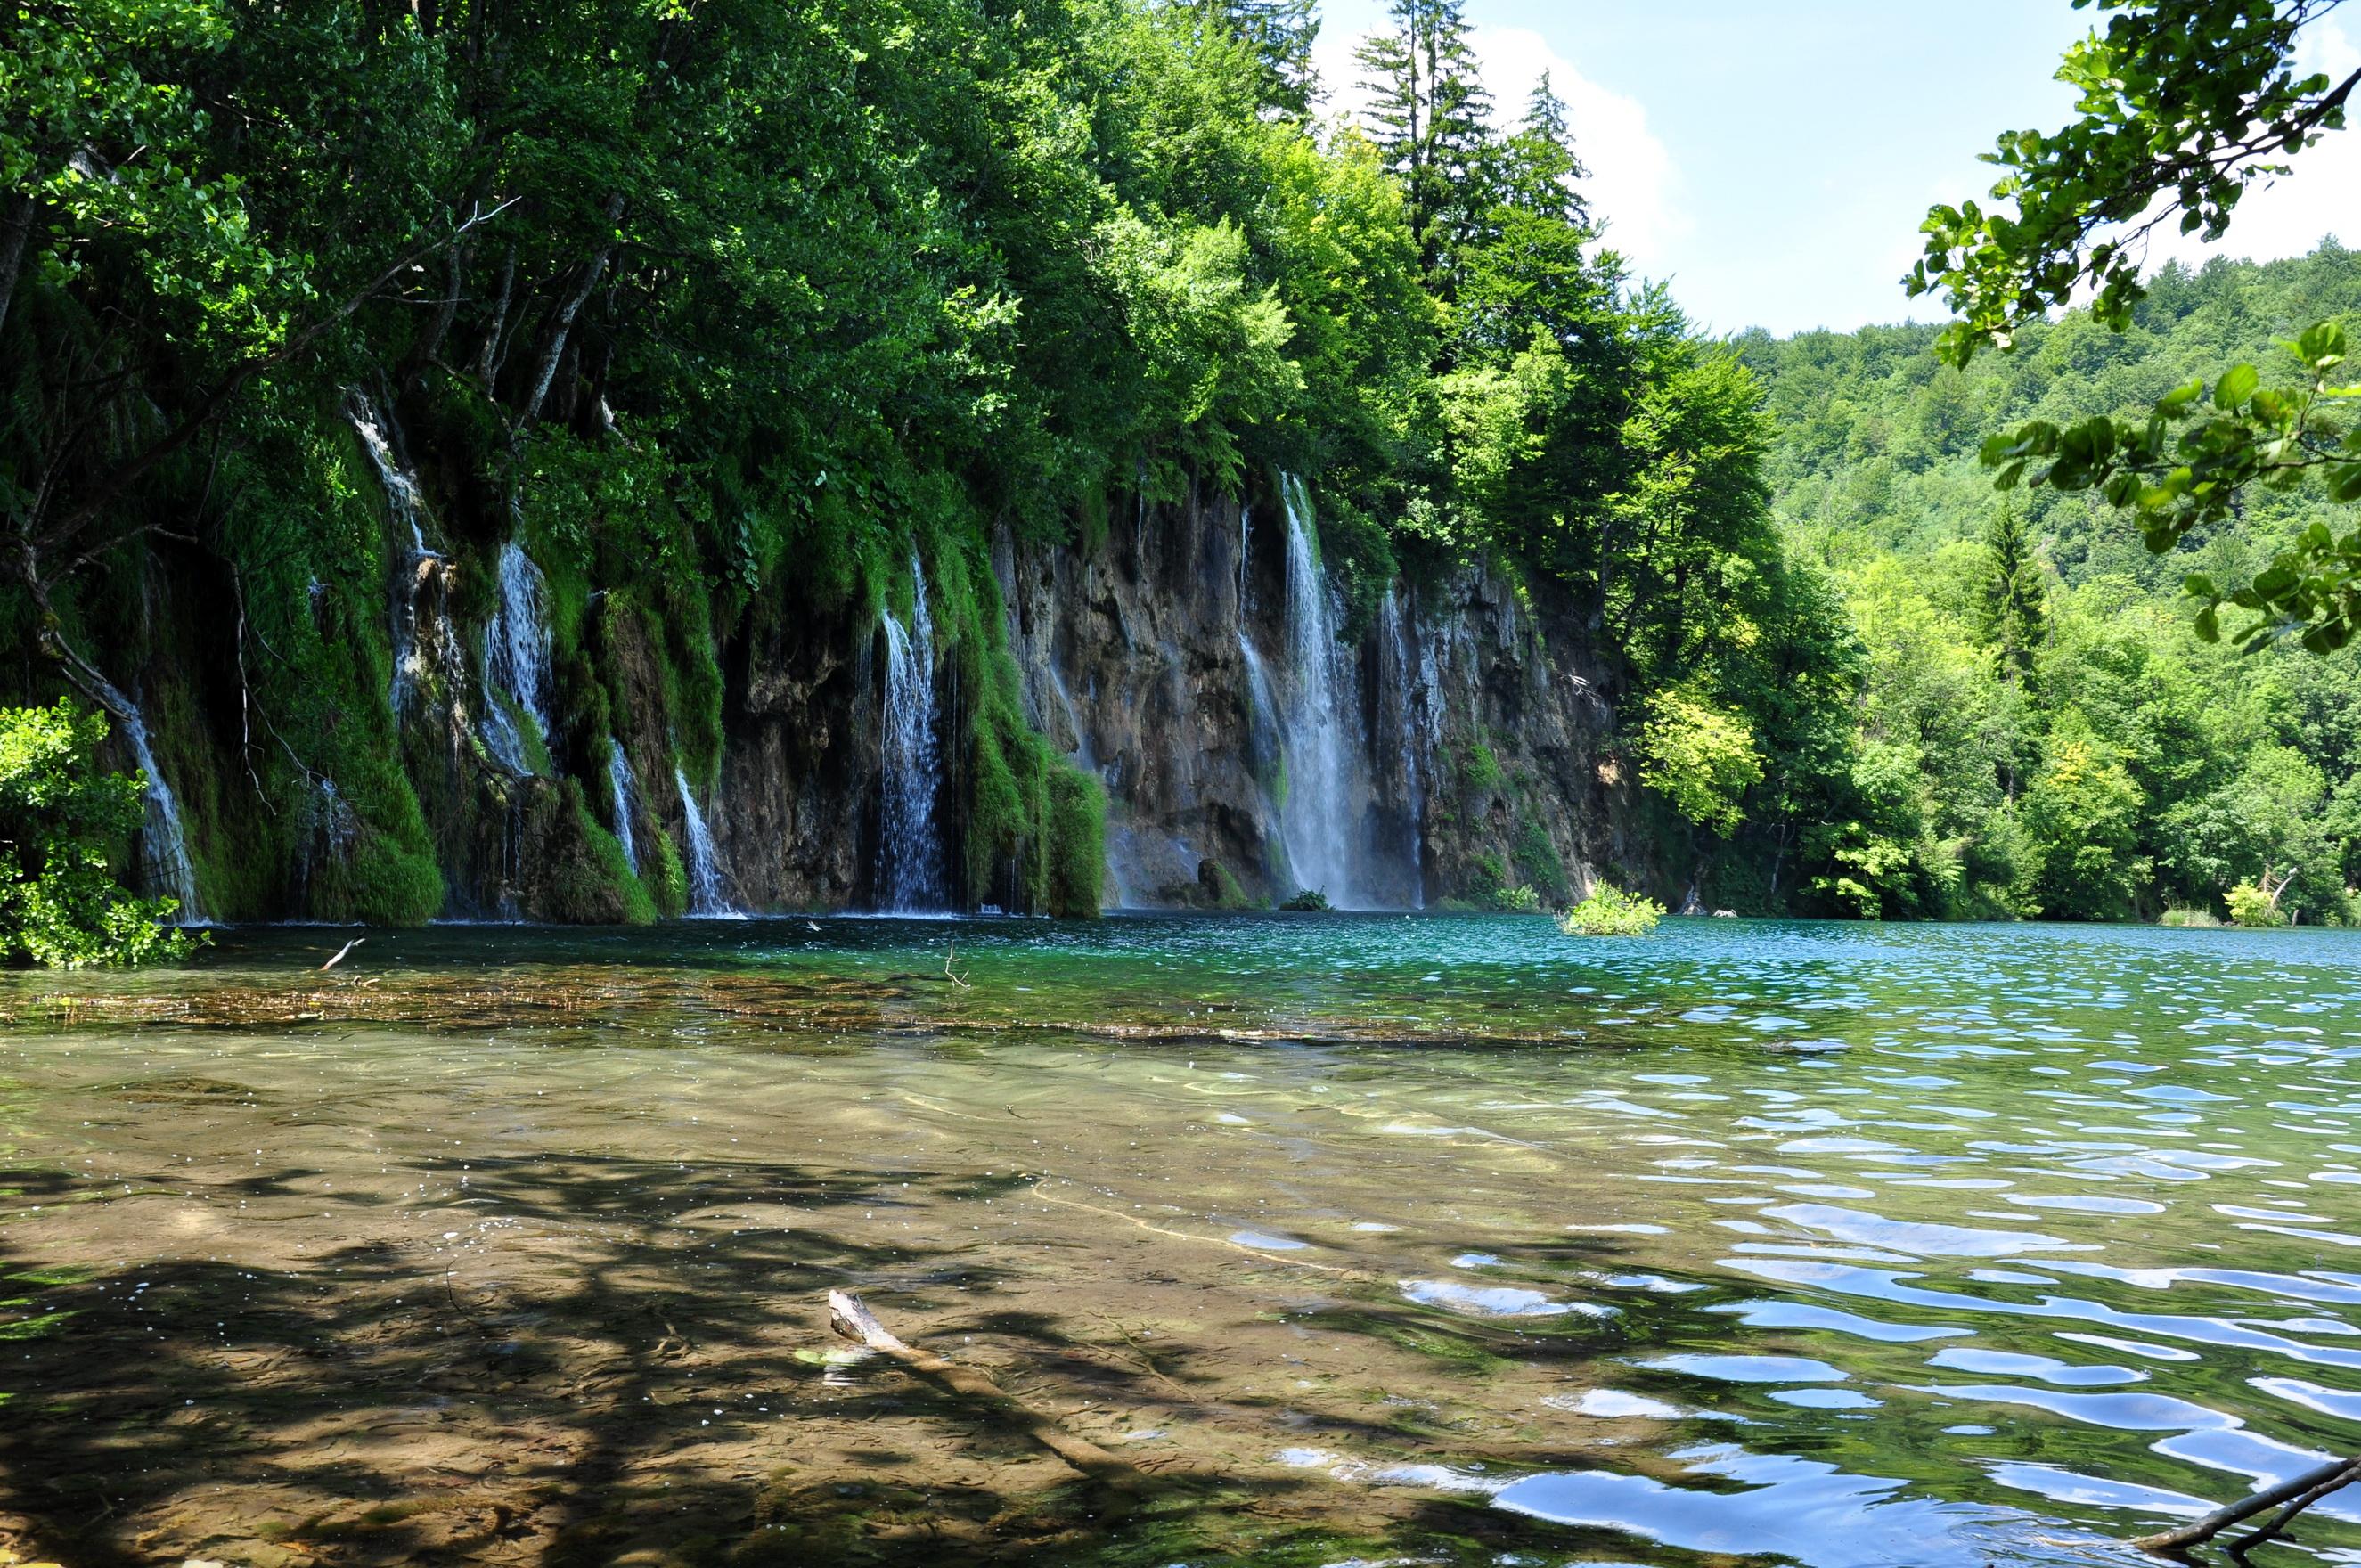 Jungle Waterfall Wallpaper Hd: Waterfall HD Wallpaper